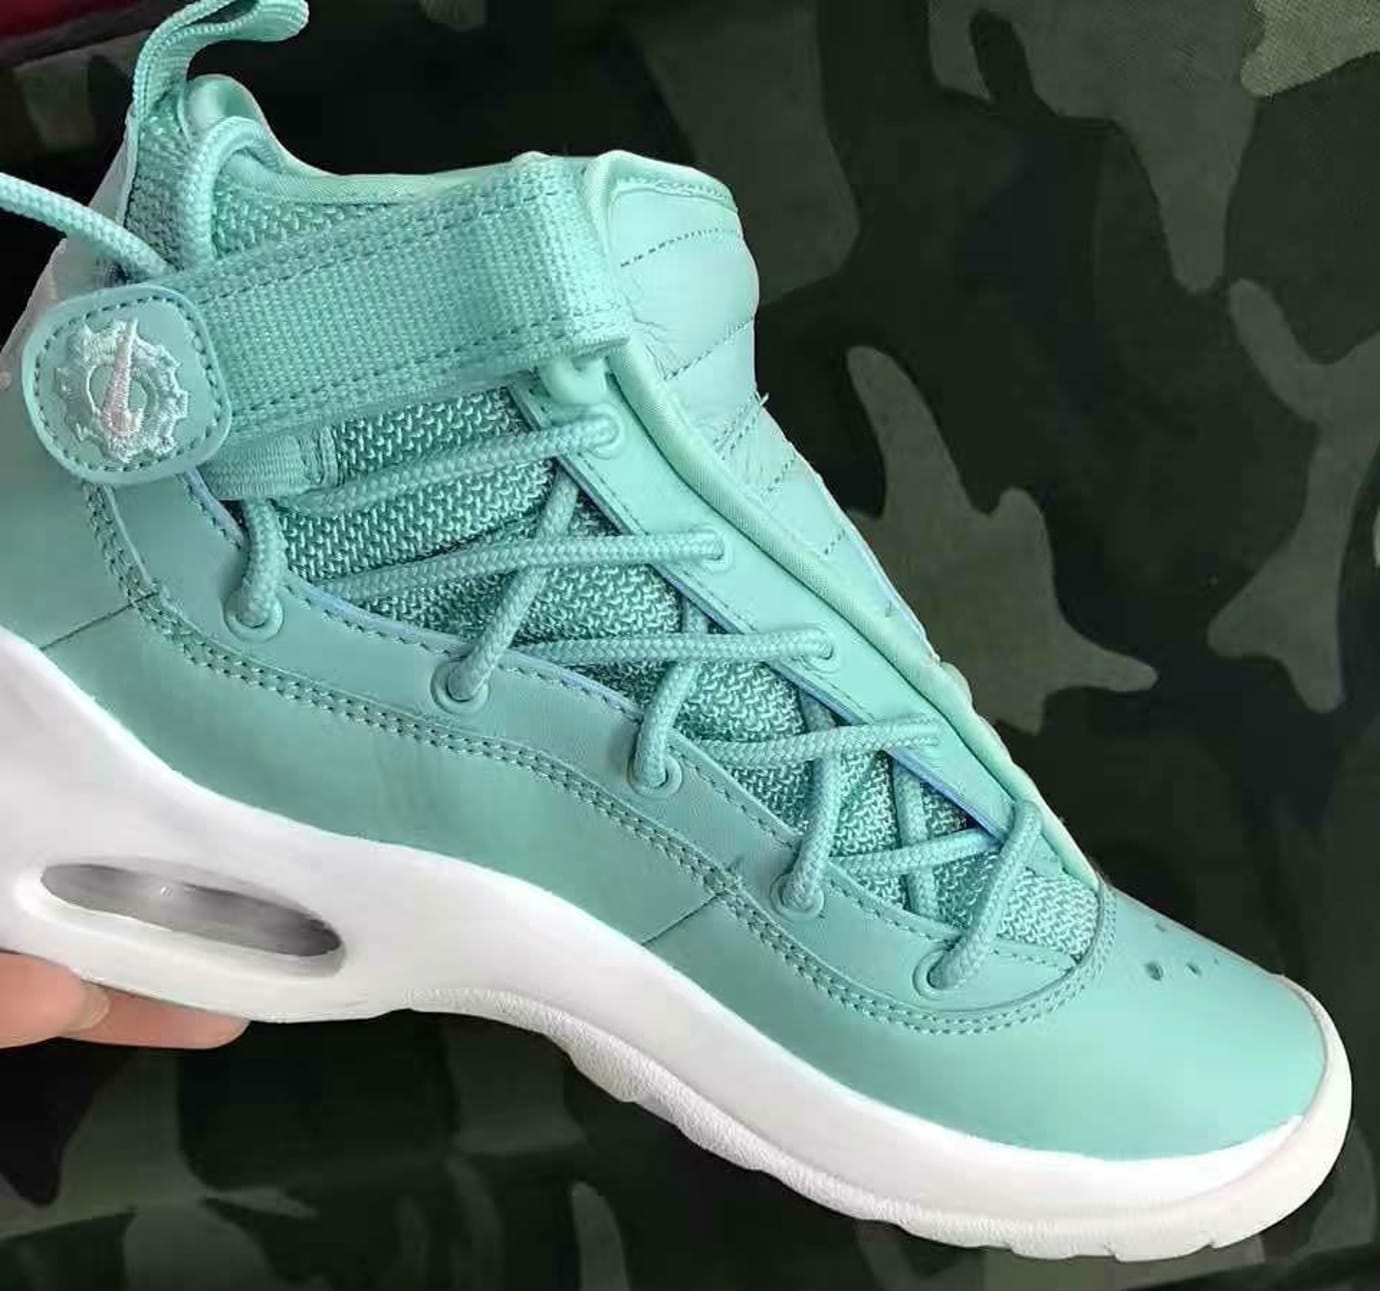 Nike Air Shake Ndestrukt Mint Green Teal Release Date Medial